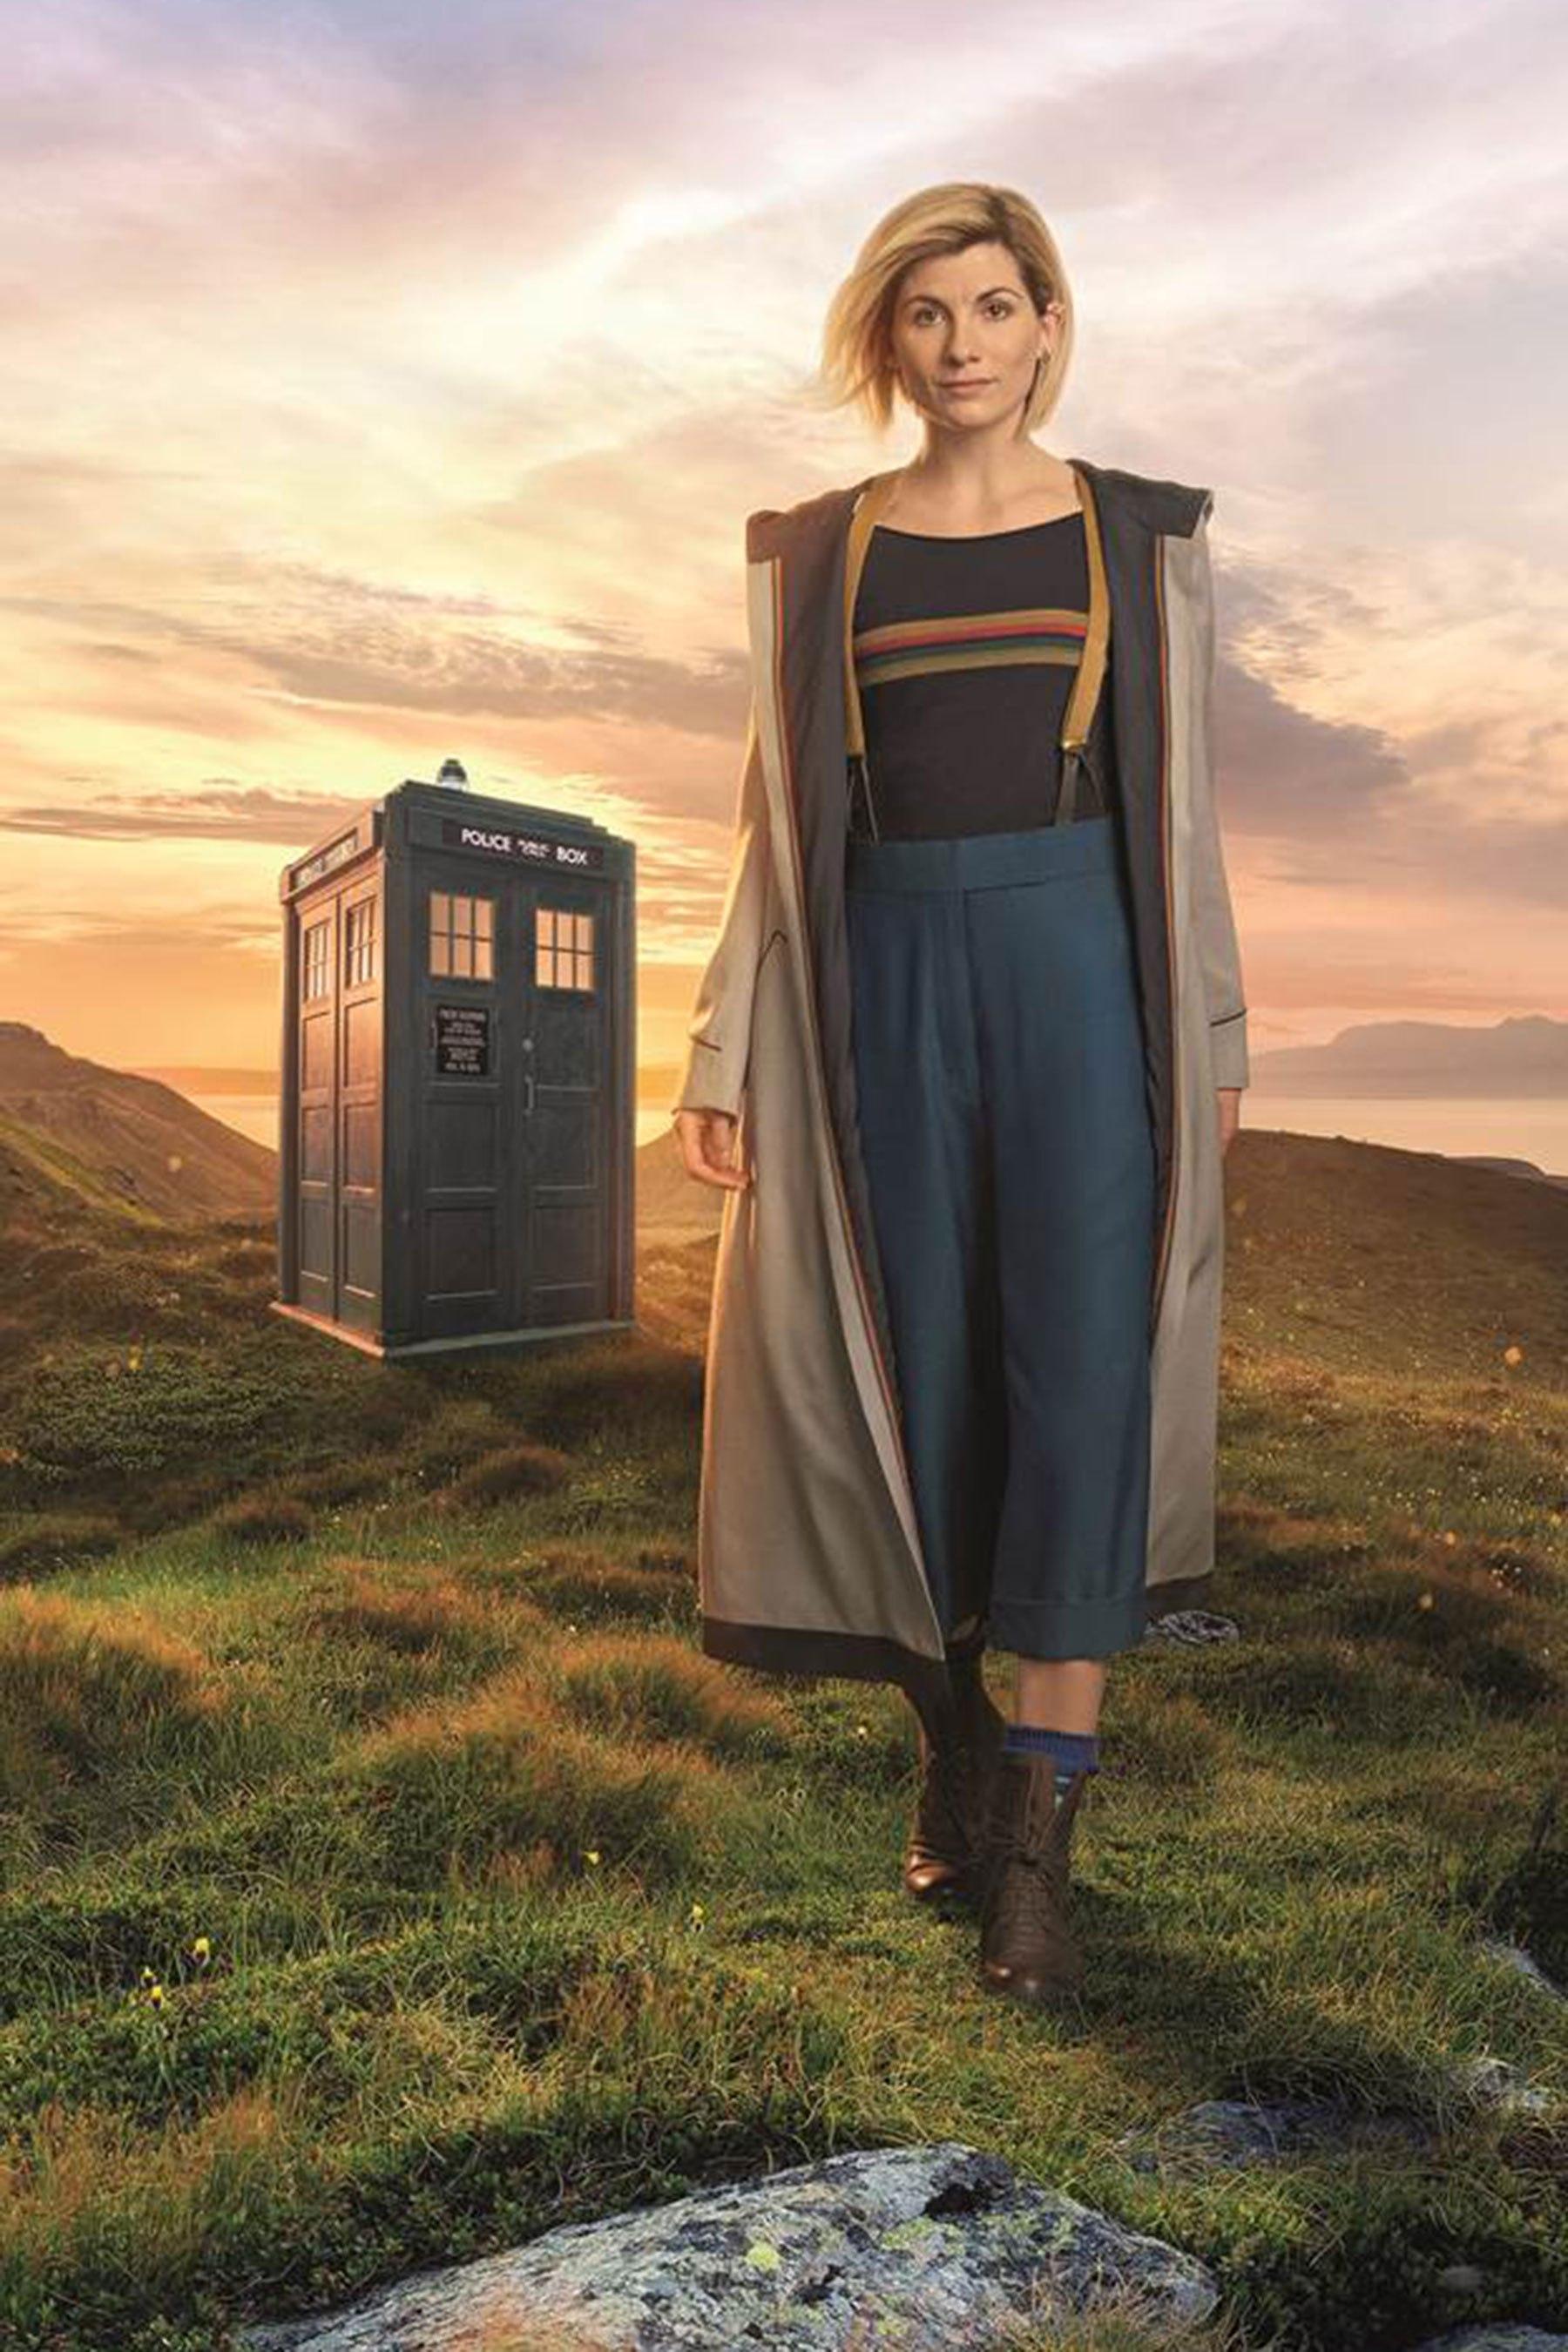 Tardis Girl Wallpaper Foto Revela Visual De Jodie Whittaker Como A Nova Doctor